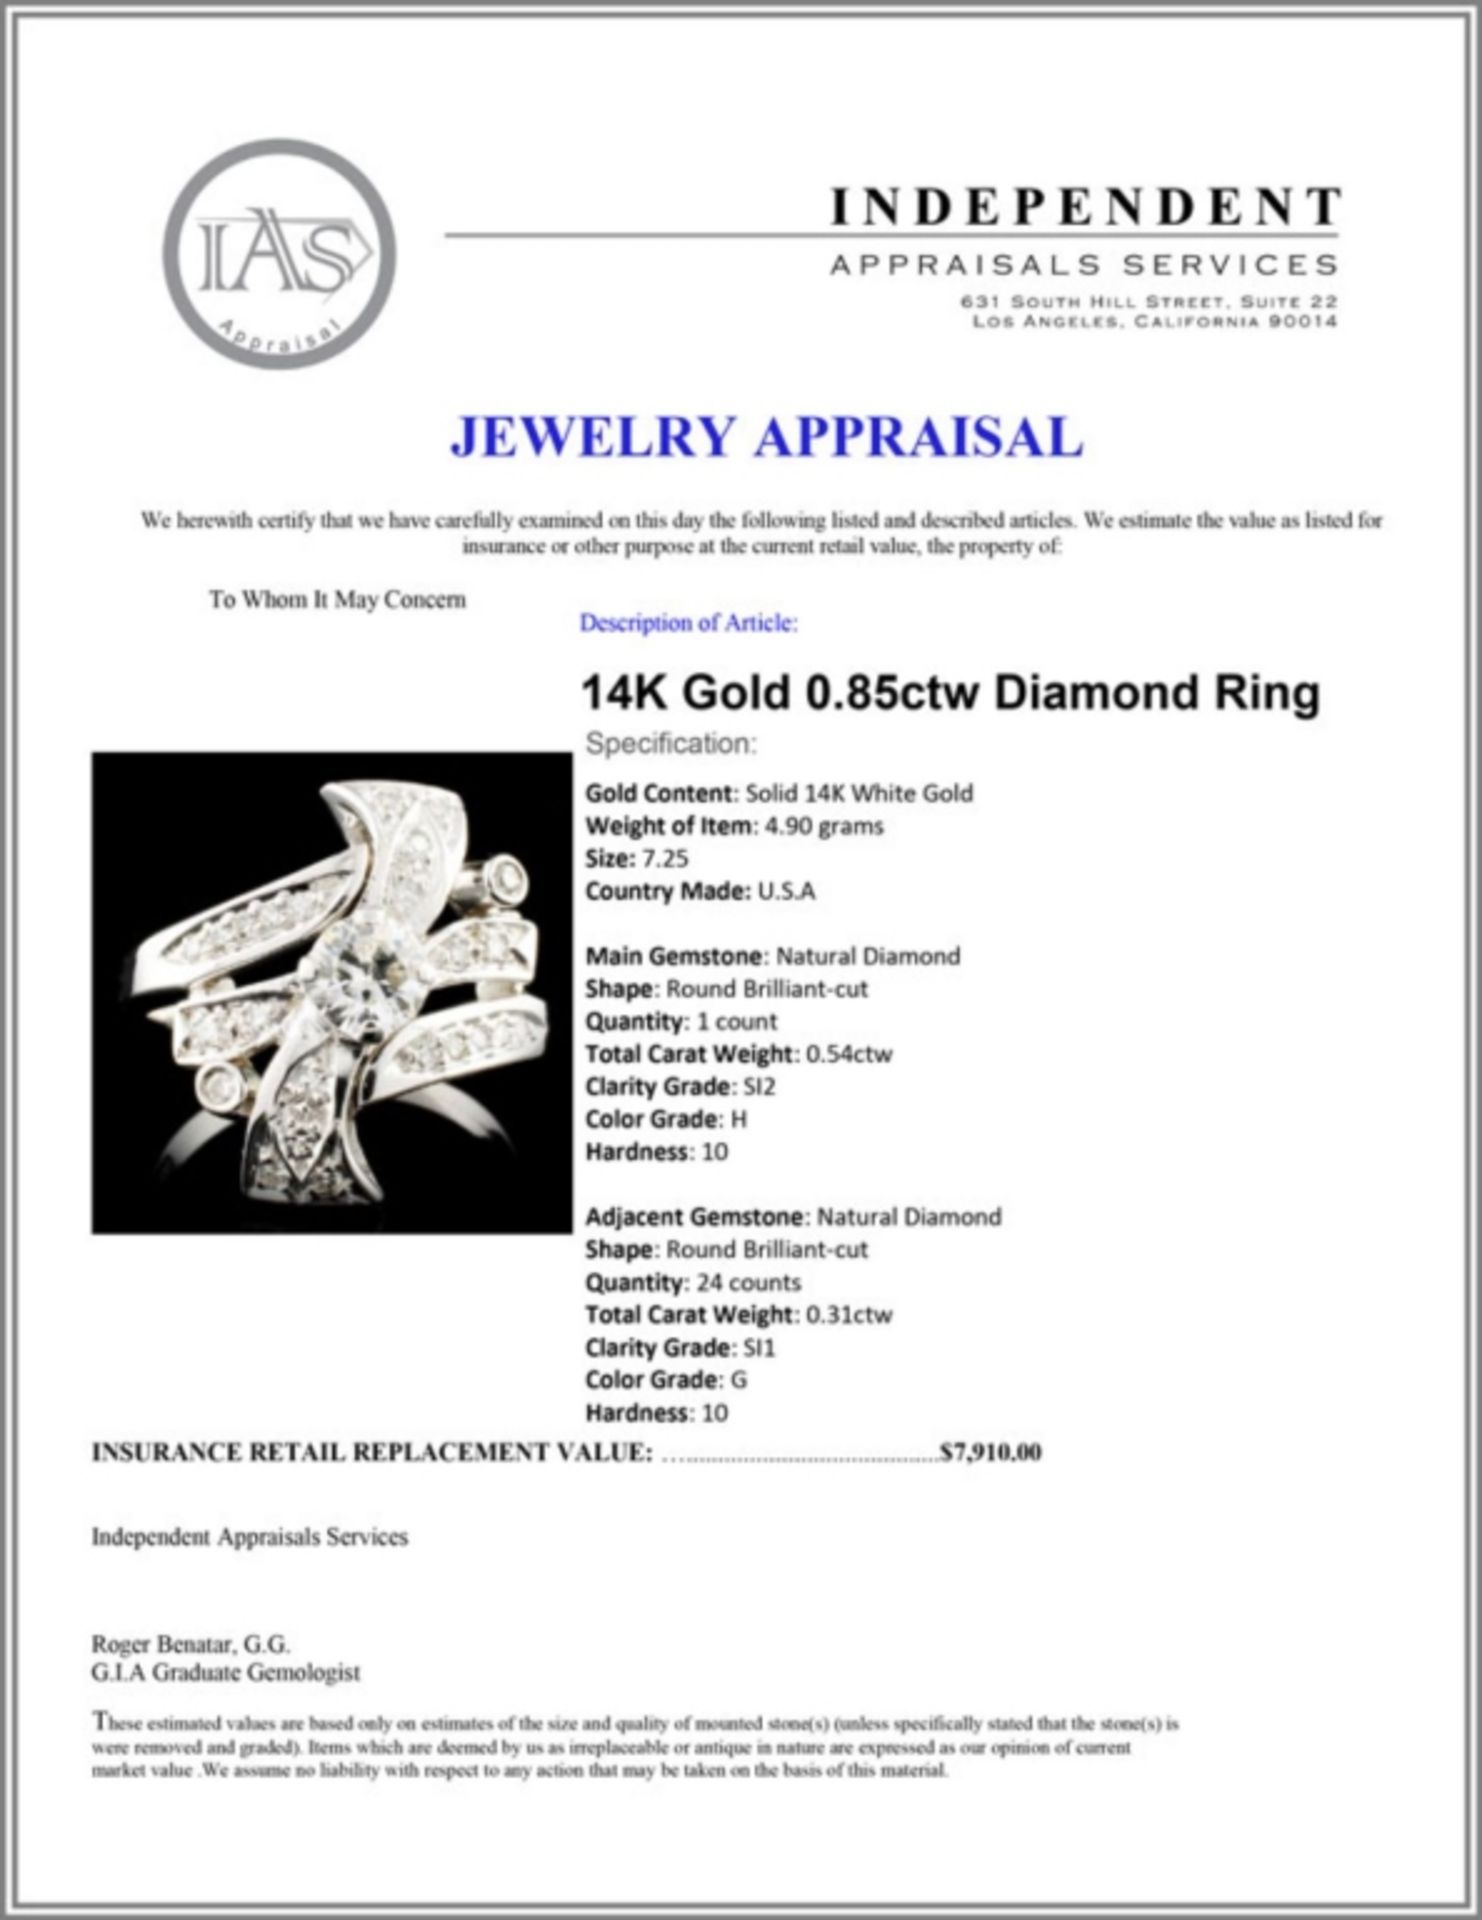 14K Gold 0.85ctw Diamond Ring - Image 5 of 5